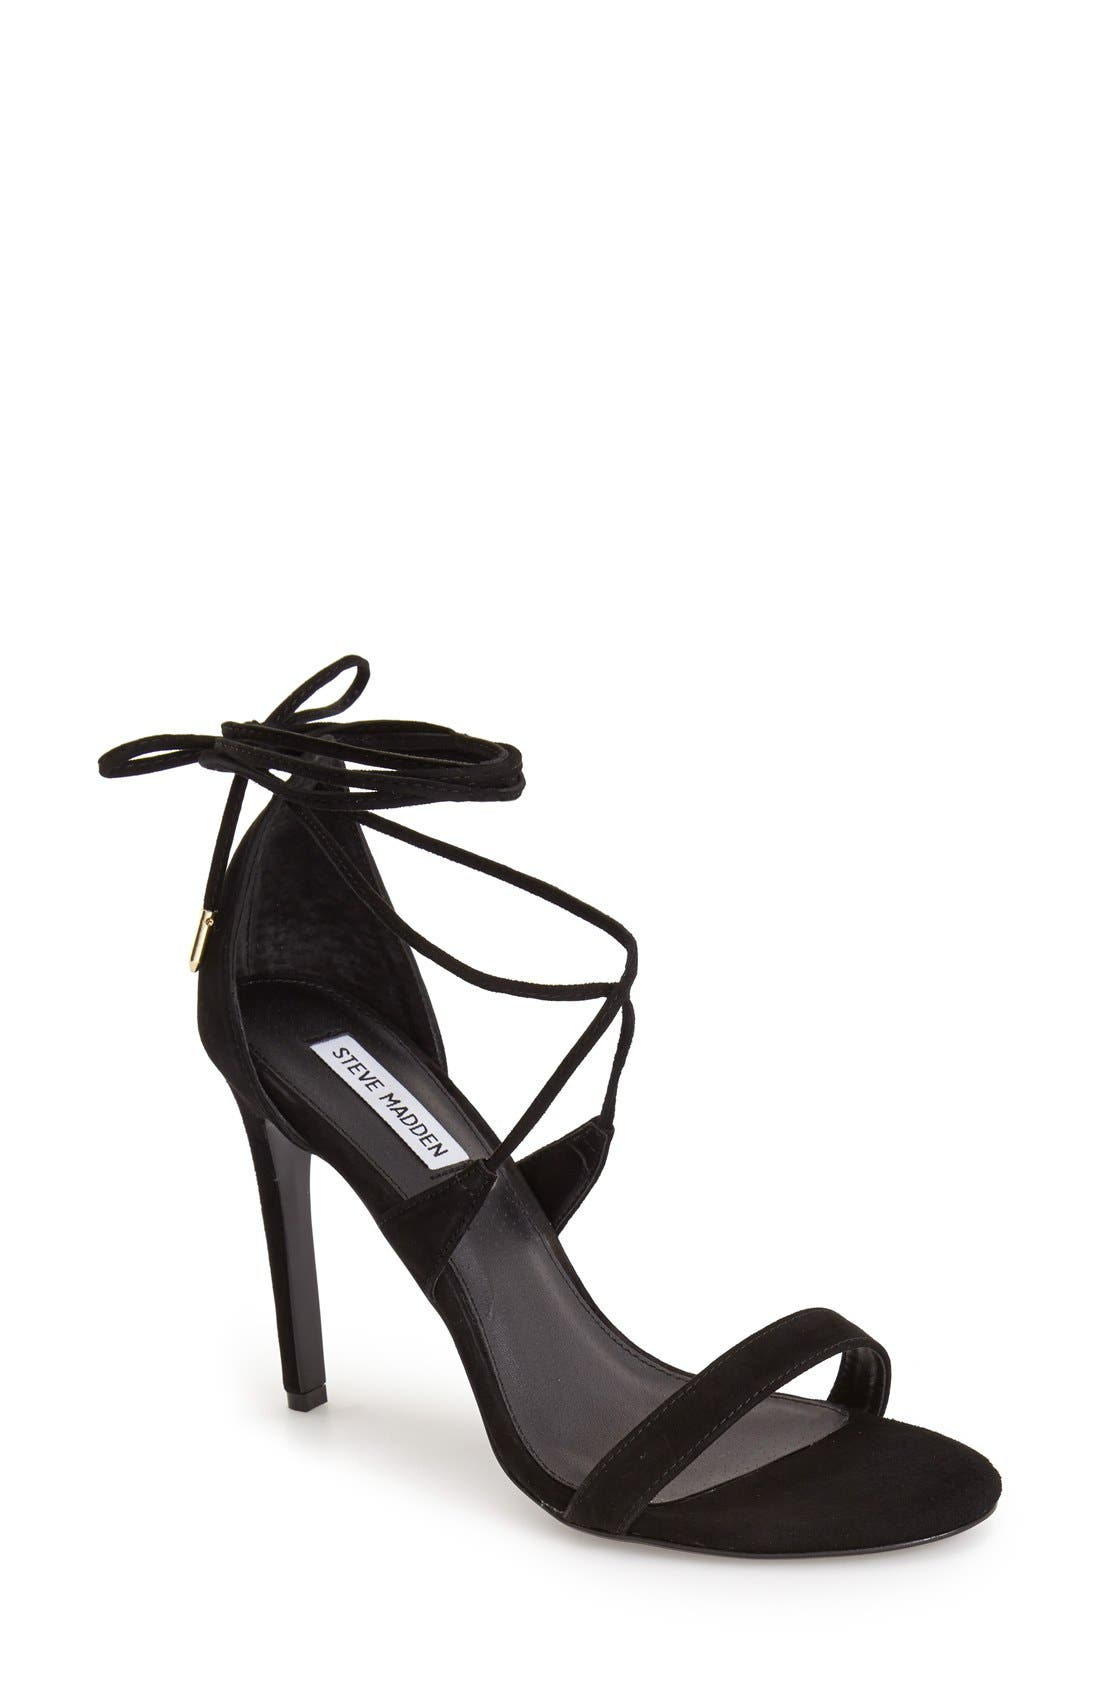 'Presidnt' Lace-Up Sandal,                             Main thumbnail 1, color,                             Black Suede